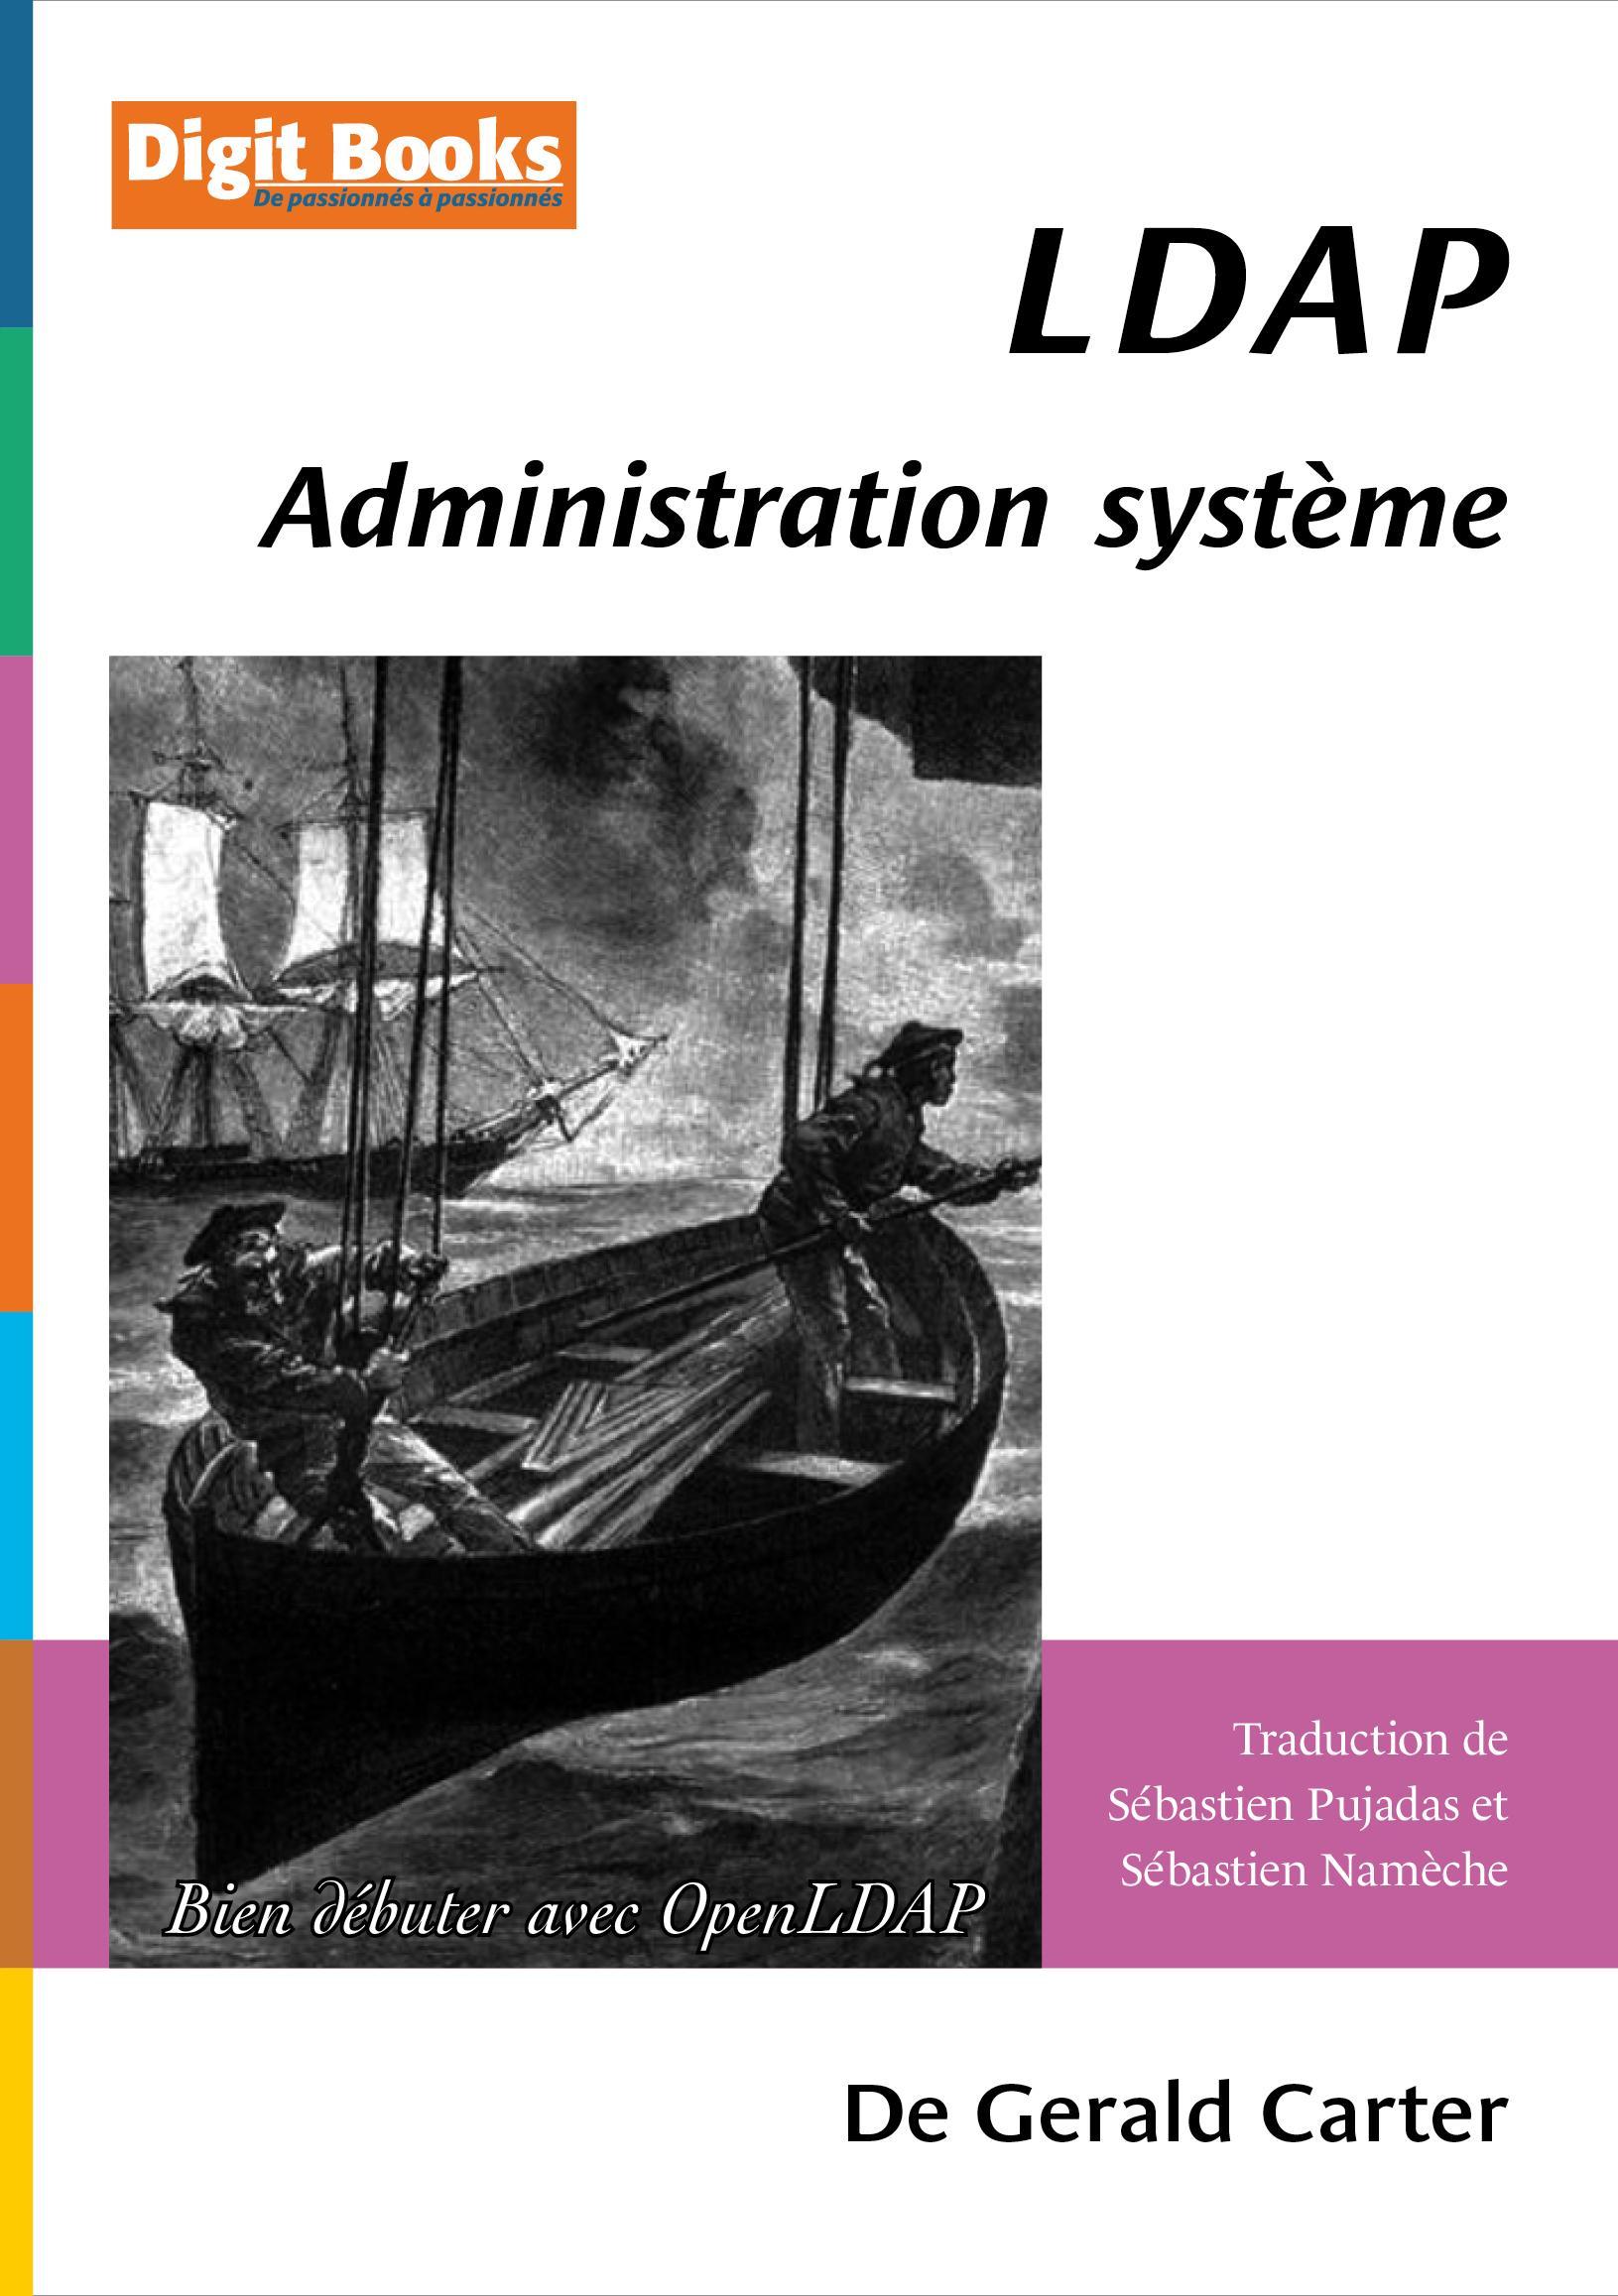 LDAP - Administration système